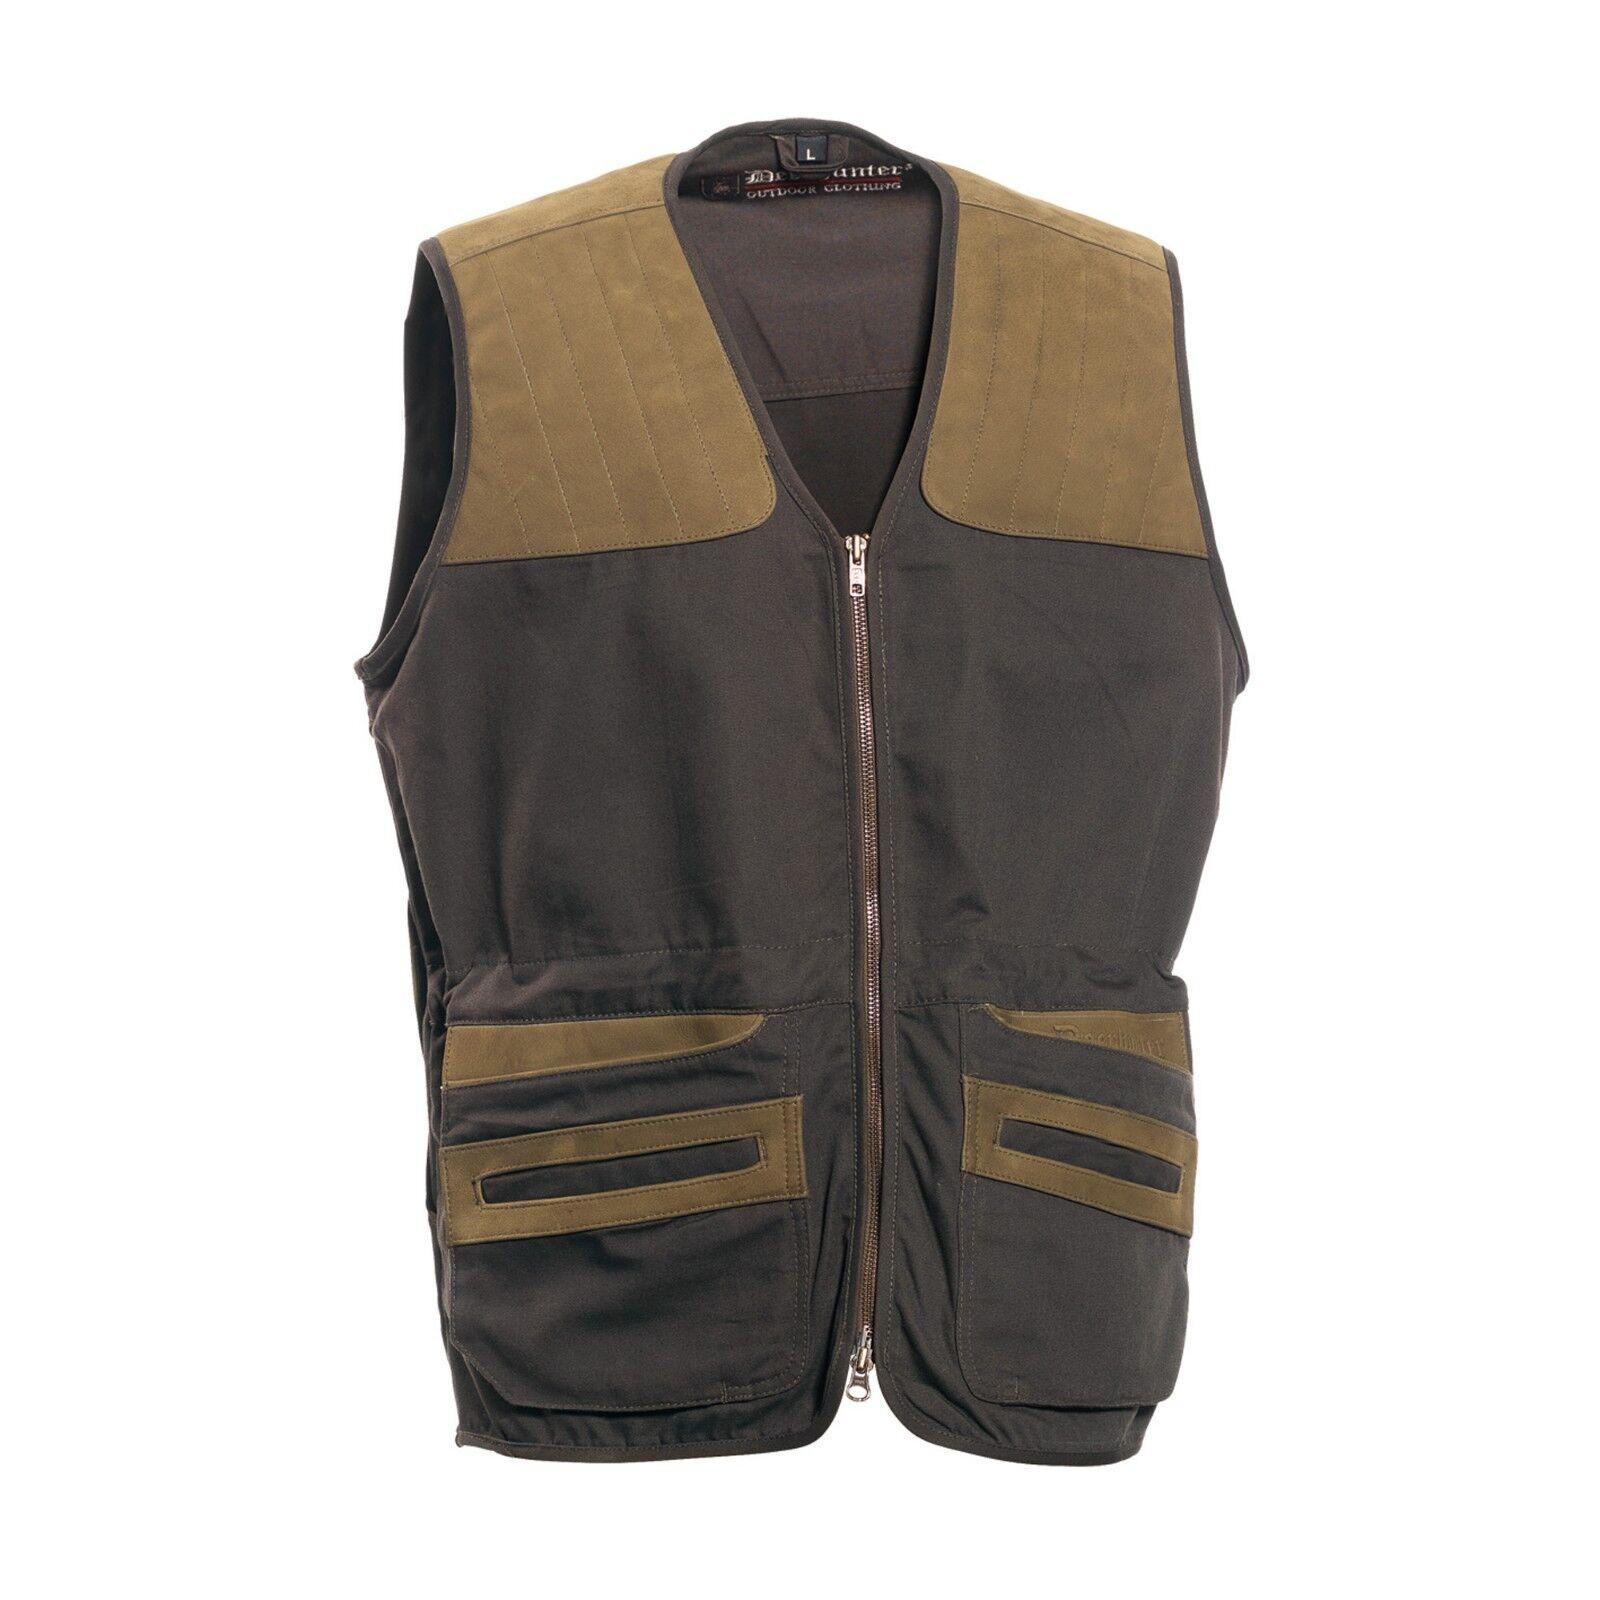 Deerhunter Monteria Hunting Shooting Vest Super Special Savings offer 50%